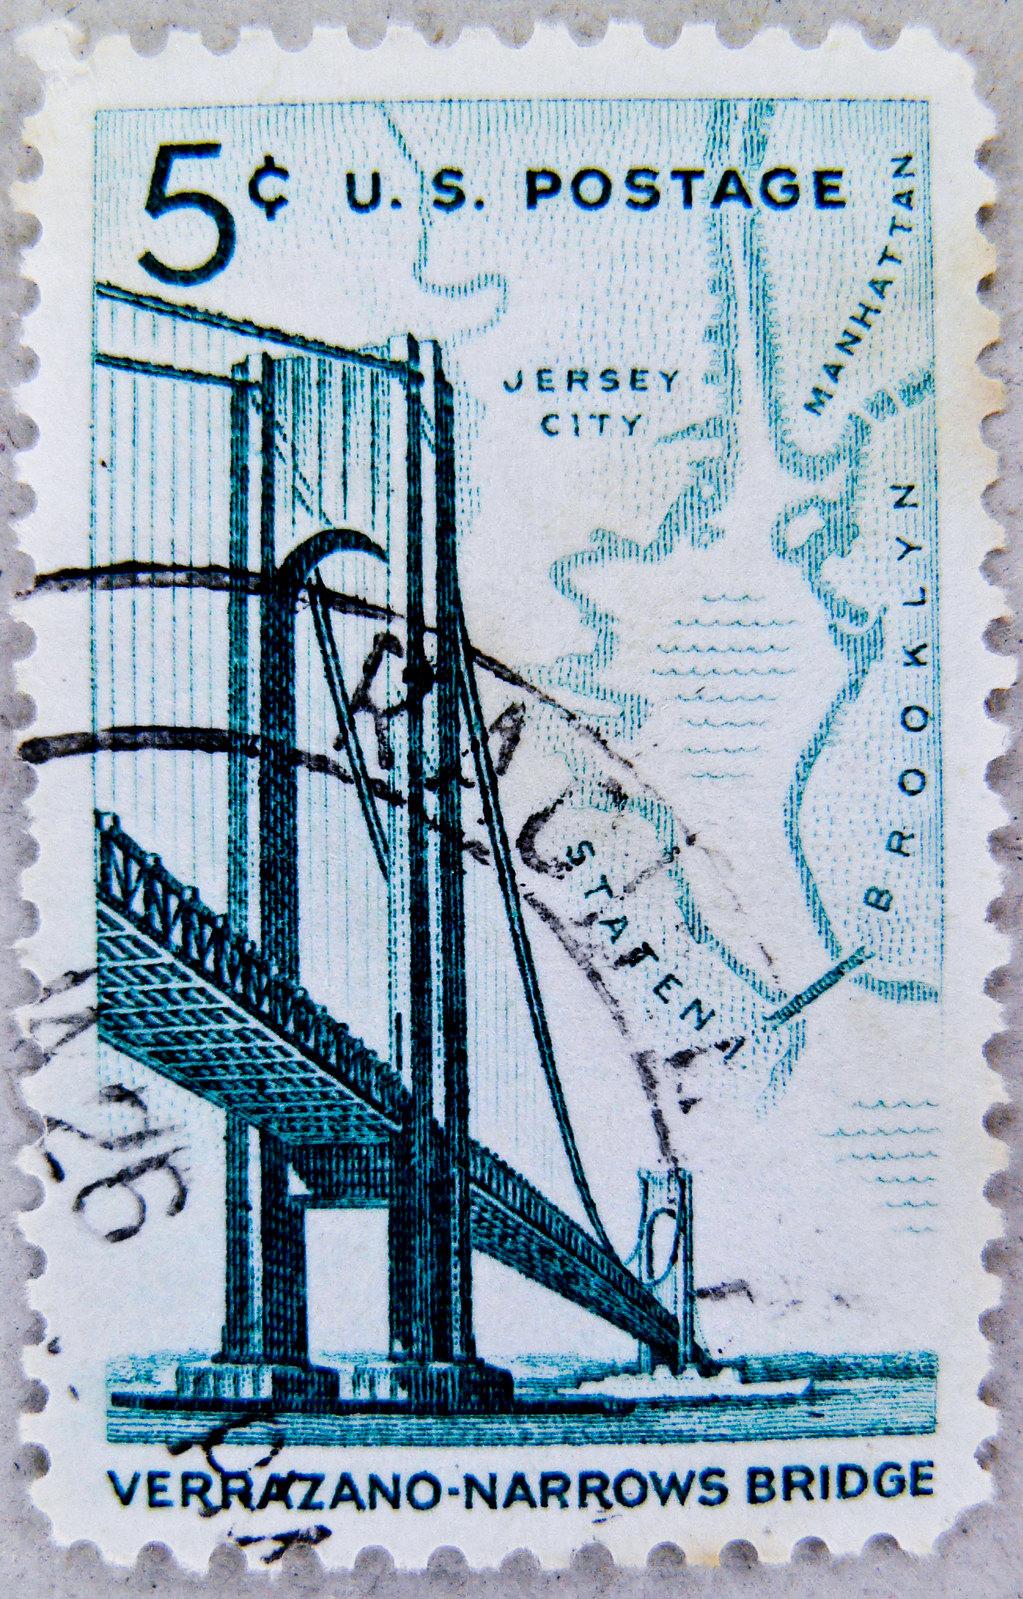 "great stamp USA 5c u.s. postage (Varrazano-Narrows Bridge / Brooklyn-Staten Island; bridge known as ""Start"" of New York City Marathon) United States of America timbre États-Unis u.s. postage почтовая марка США pullar ABD 邮票 美国 Měiguó USA Briefmarken 郵便切手"